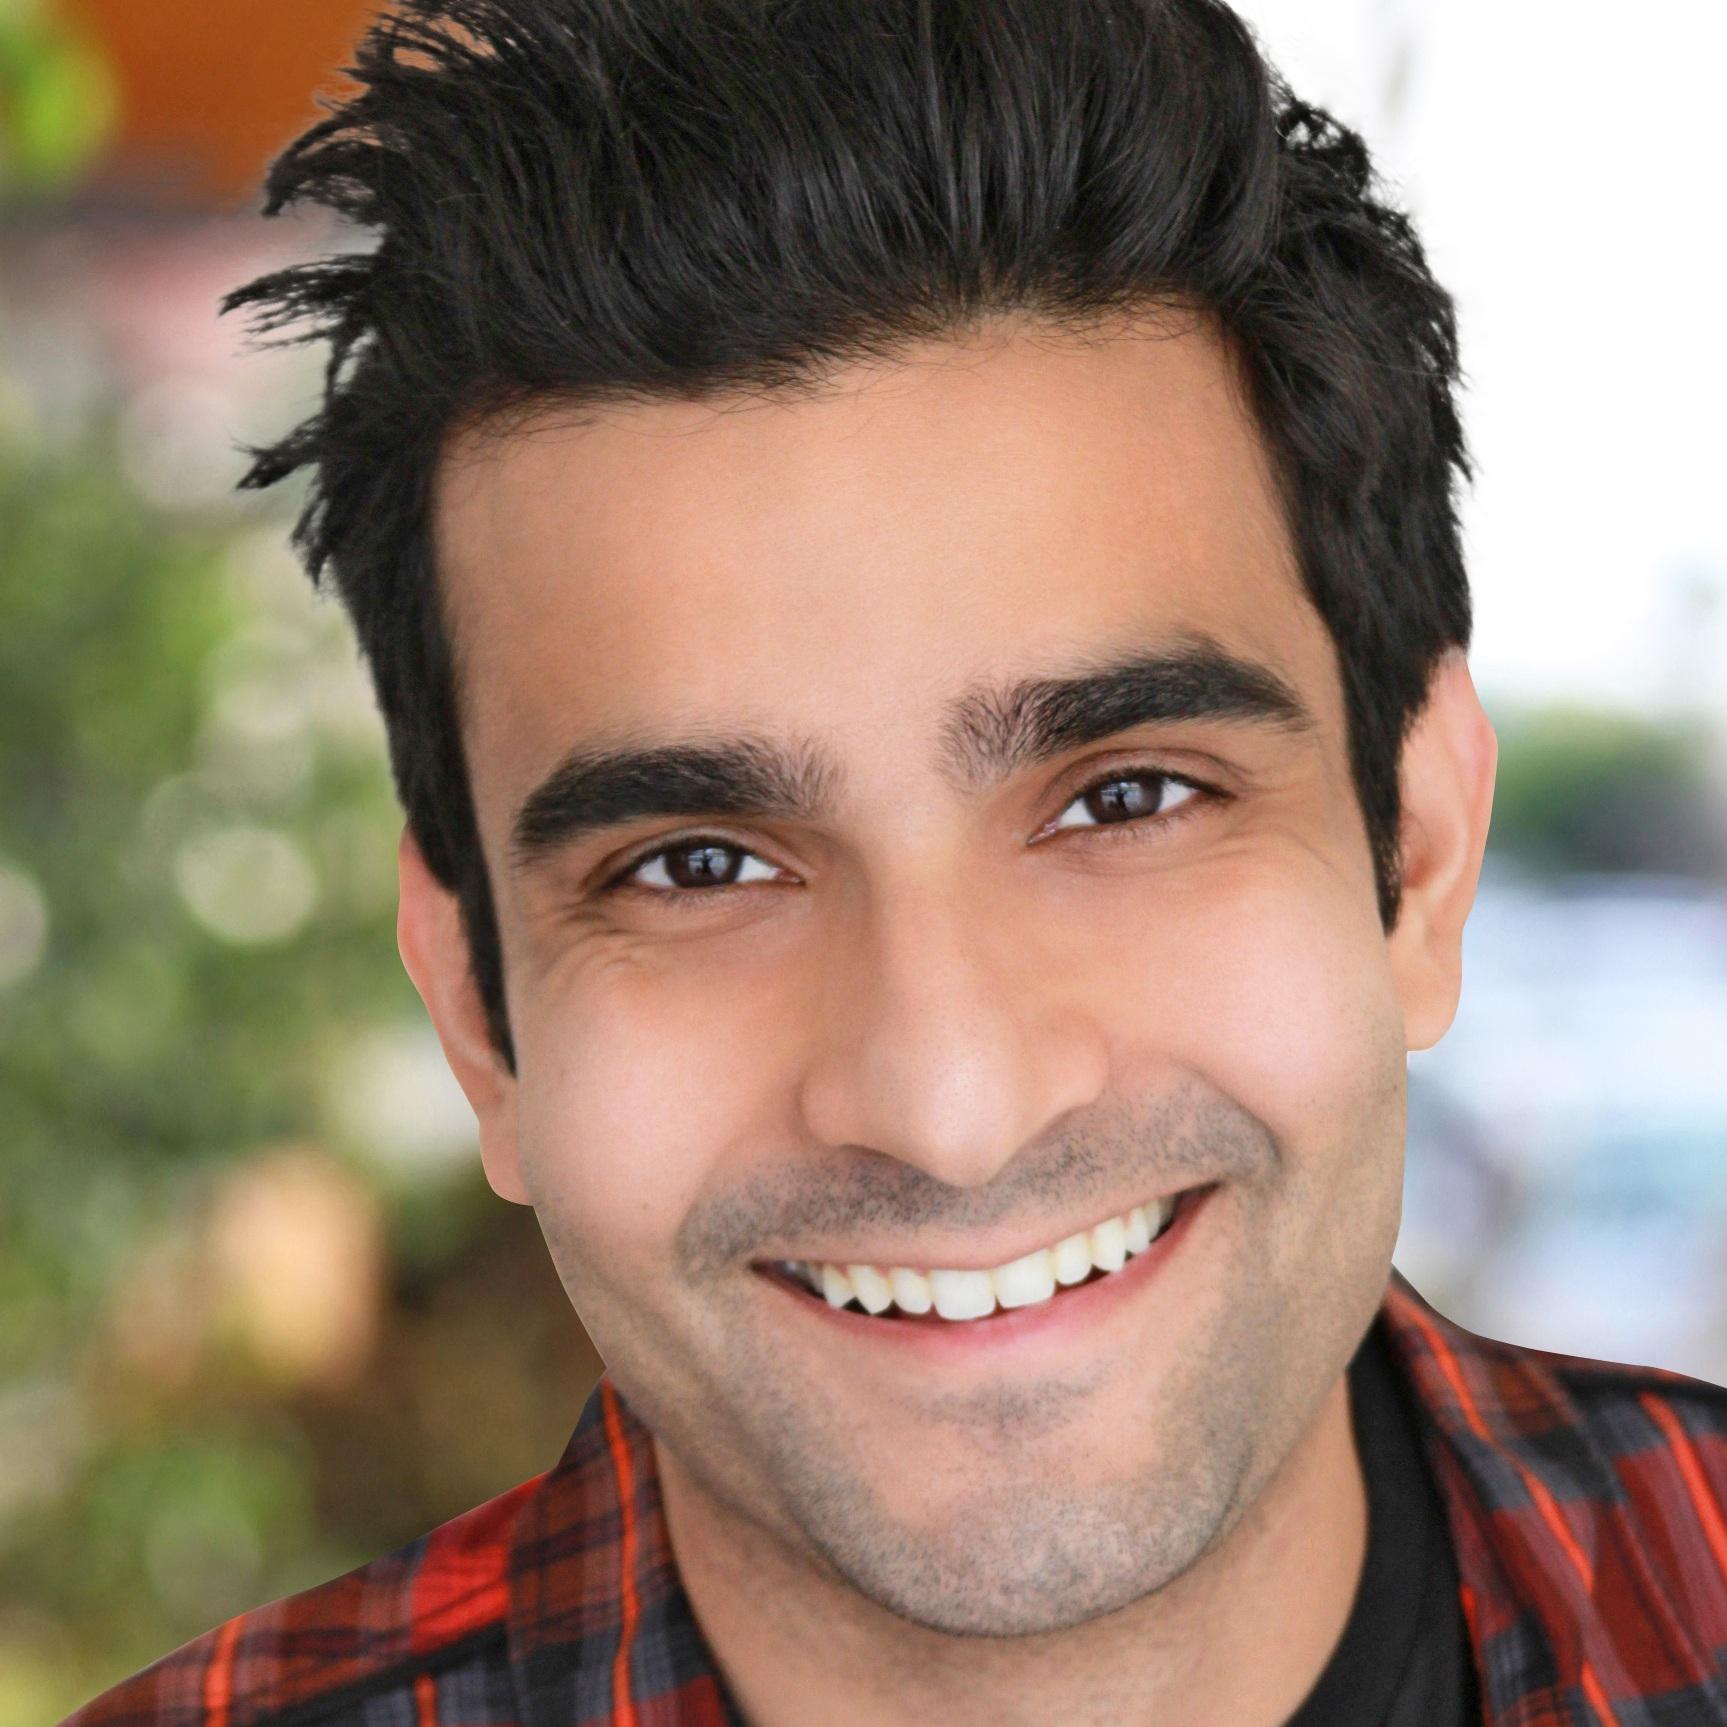 Dhruv+Uday+Singh+headshot-2+-+Dhruv+Uday+Singh.jpg